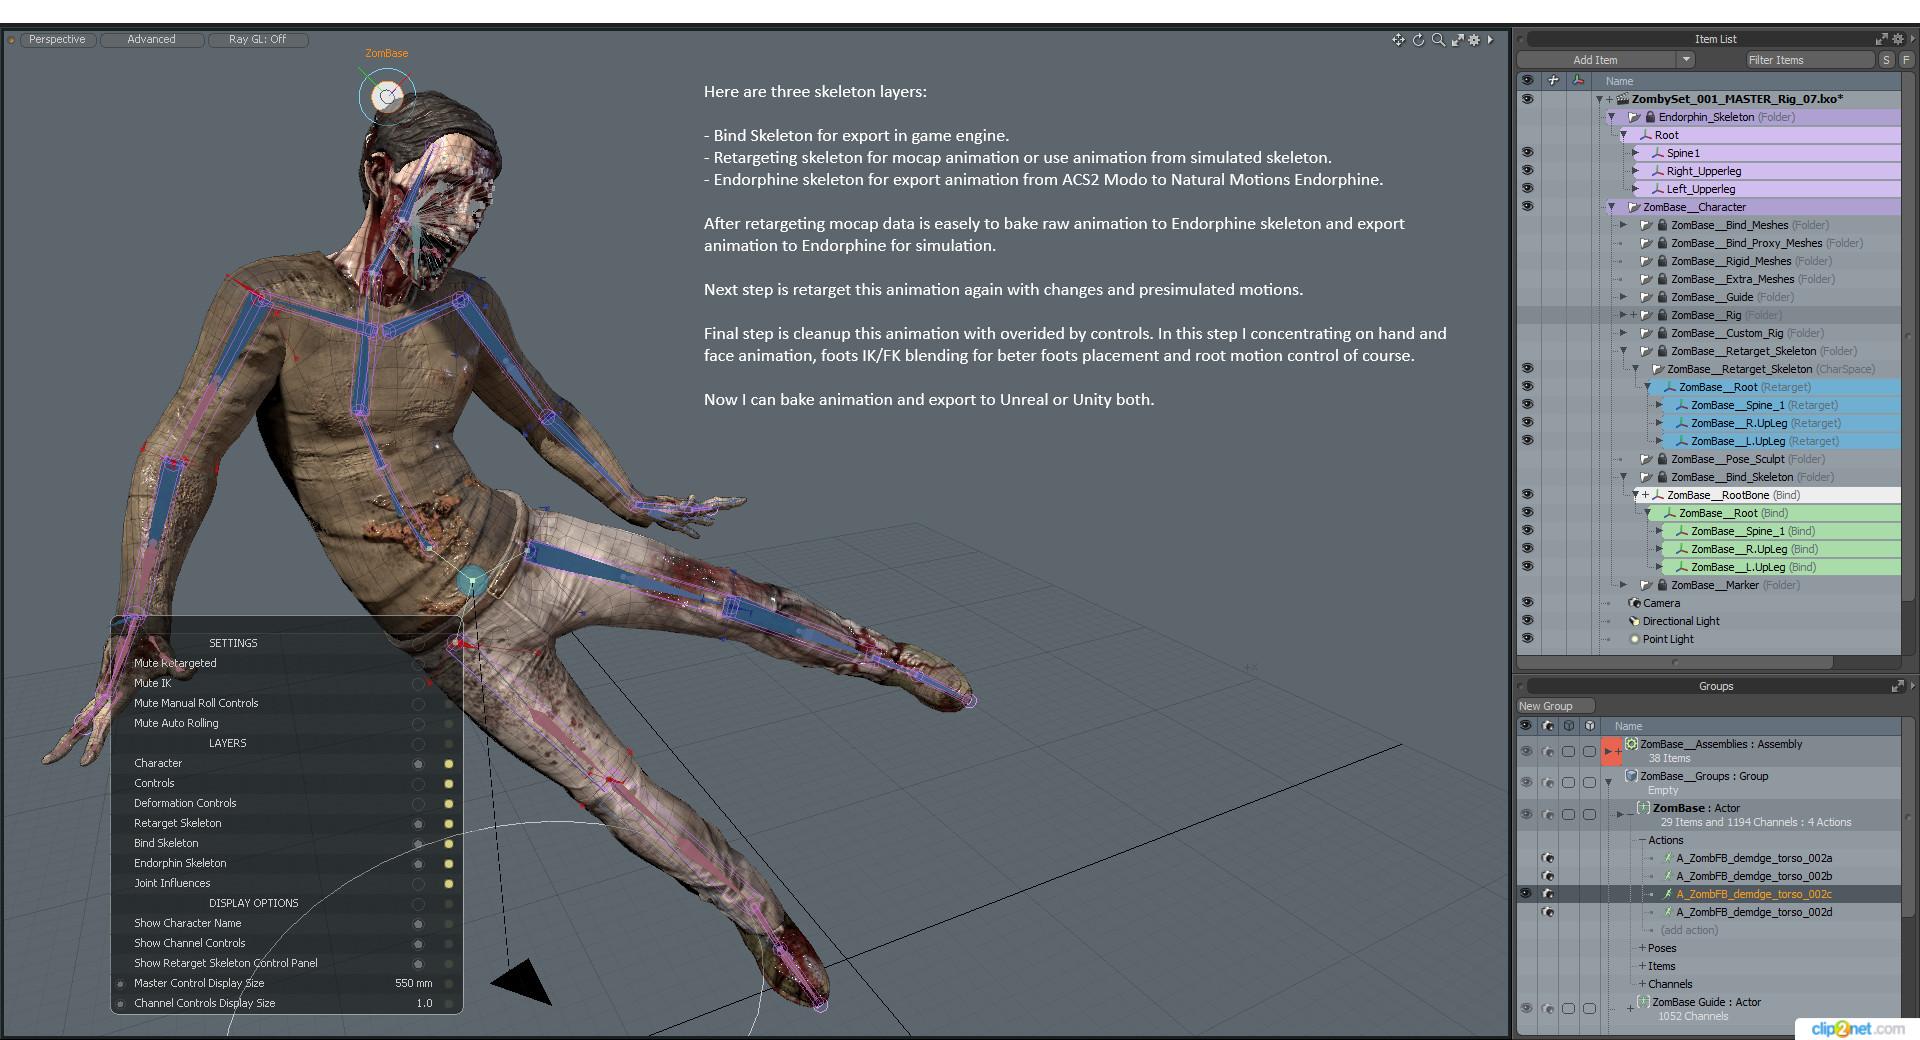 Animation Retargeting anton gornakov - modo acs2 advanced animation with extended rig.